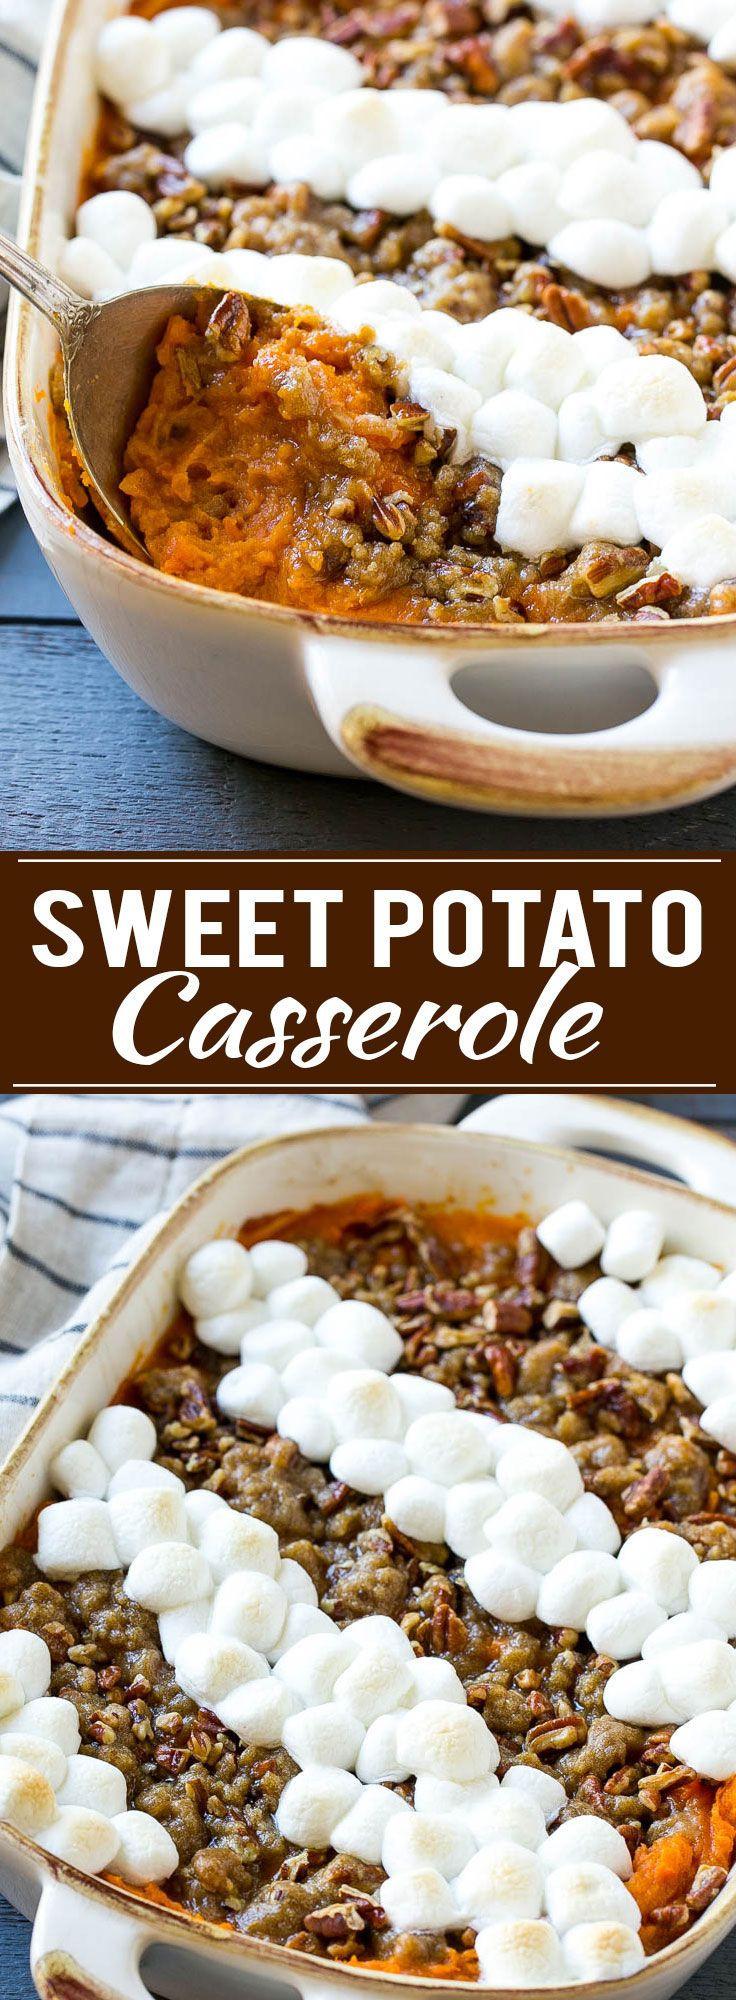 Thanksgiving Sweet Potatoes Recipe  Sweet Potato Casserole with Marshmallows